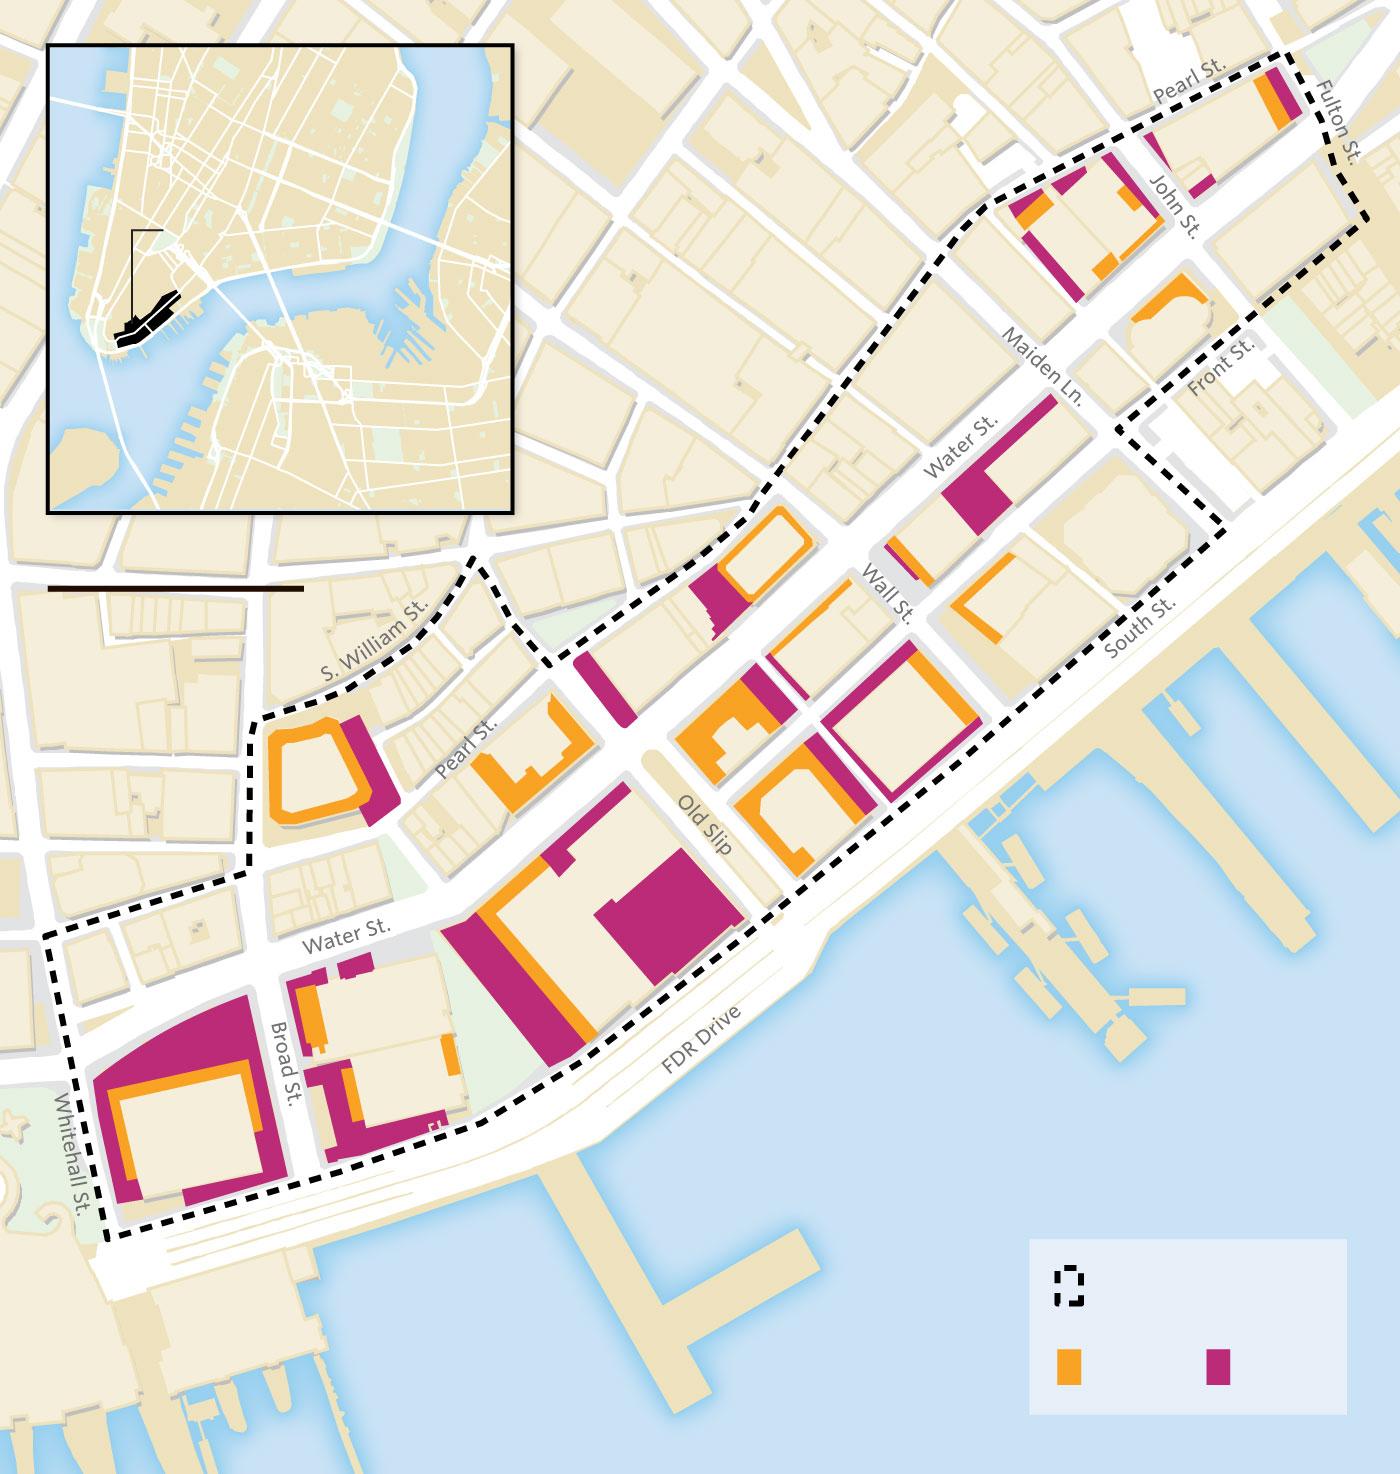 map of public spaces in FiDi